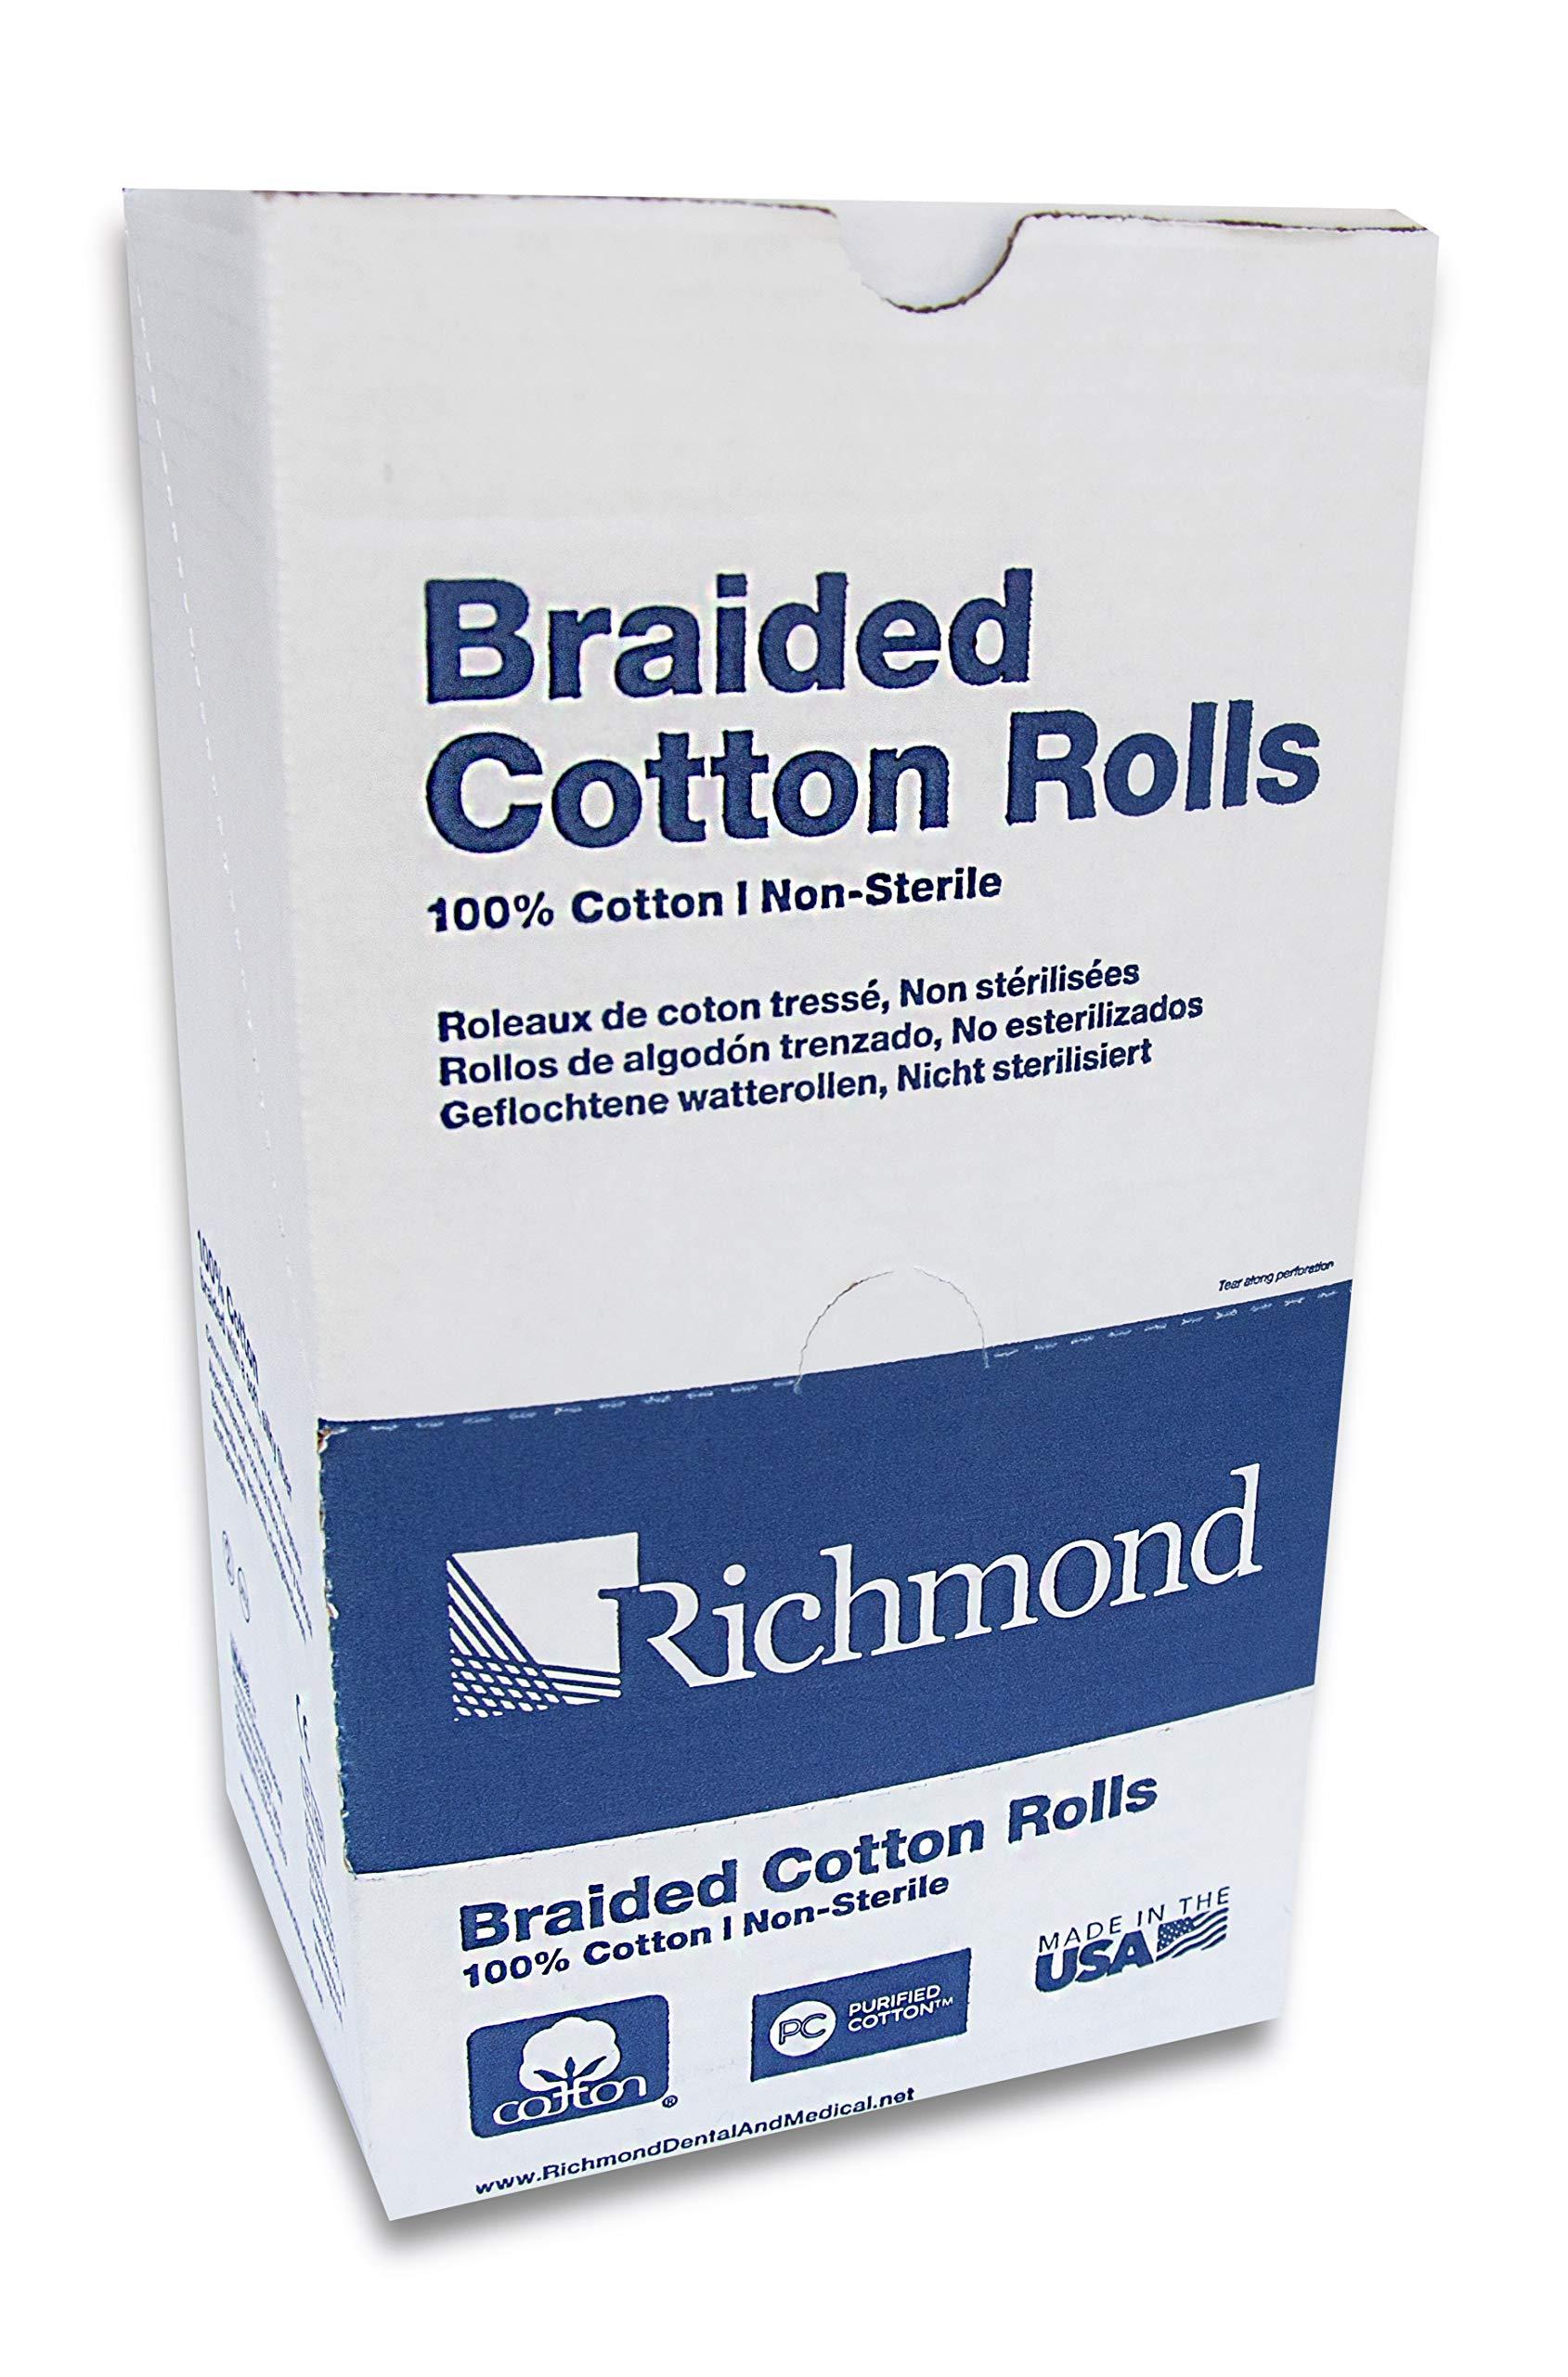 Richmond Dental & Medical 200204 1.5'', Medium Braided Cotton Roll, Nonsterile by Richmond Dental & Medical (Image #1)